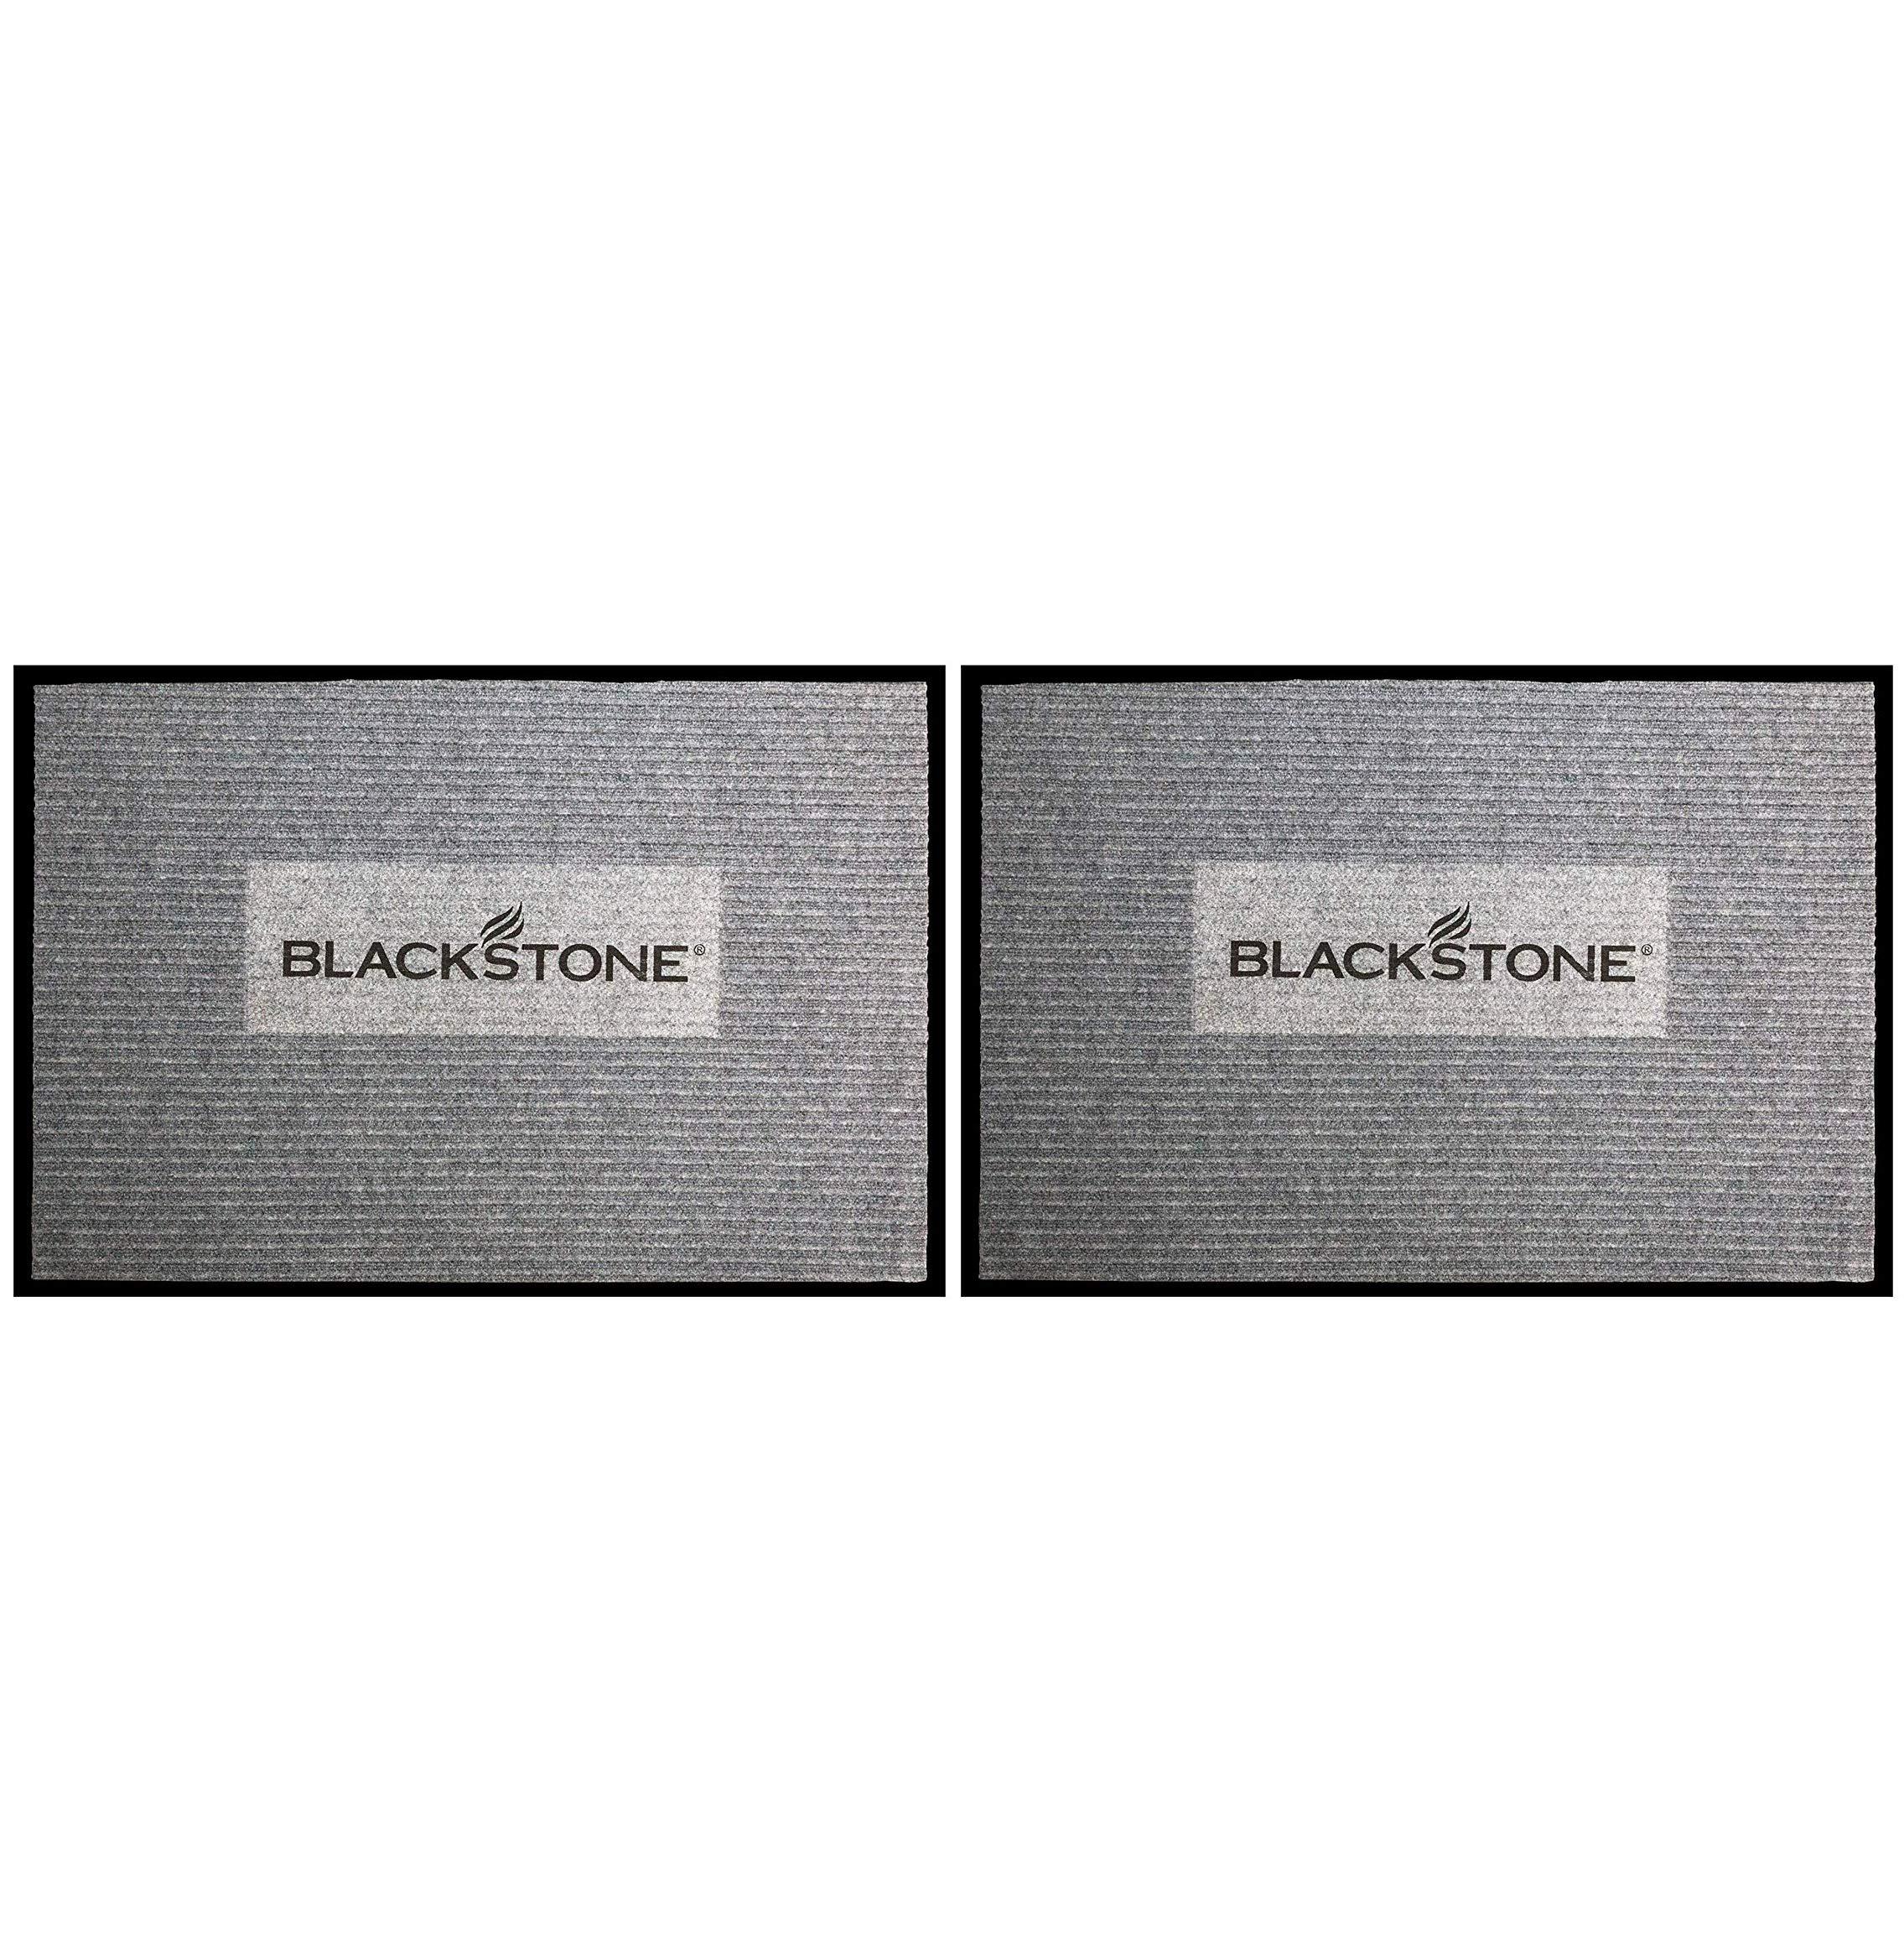 Blackstone 5036 Signature Griddle Accessories Grill Splatter Mat (Twо Pаck) by Blackstone